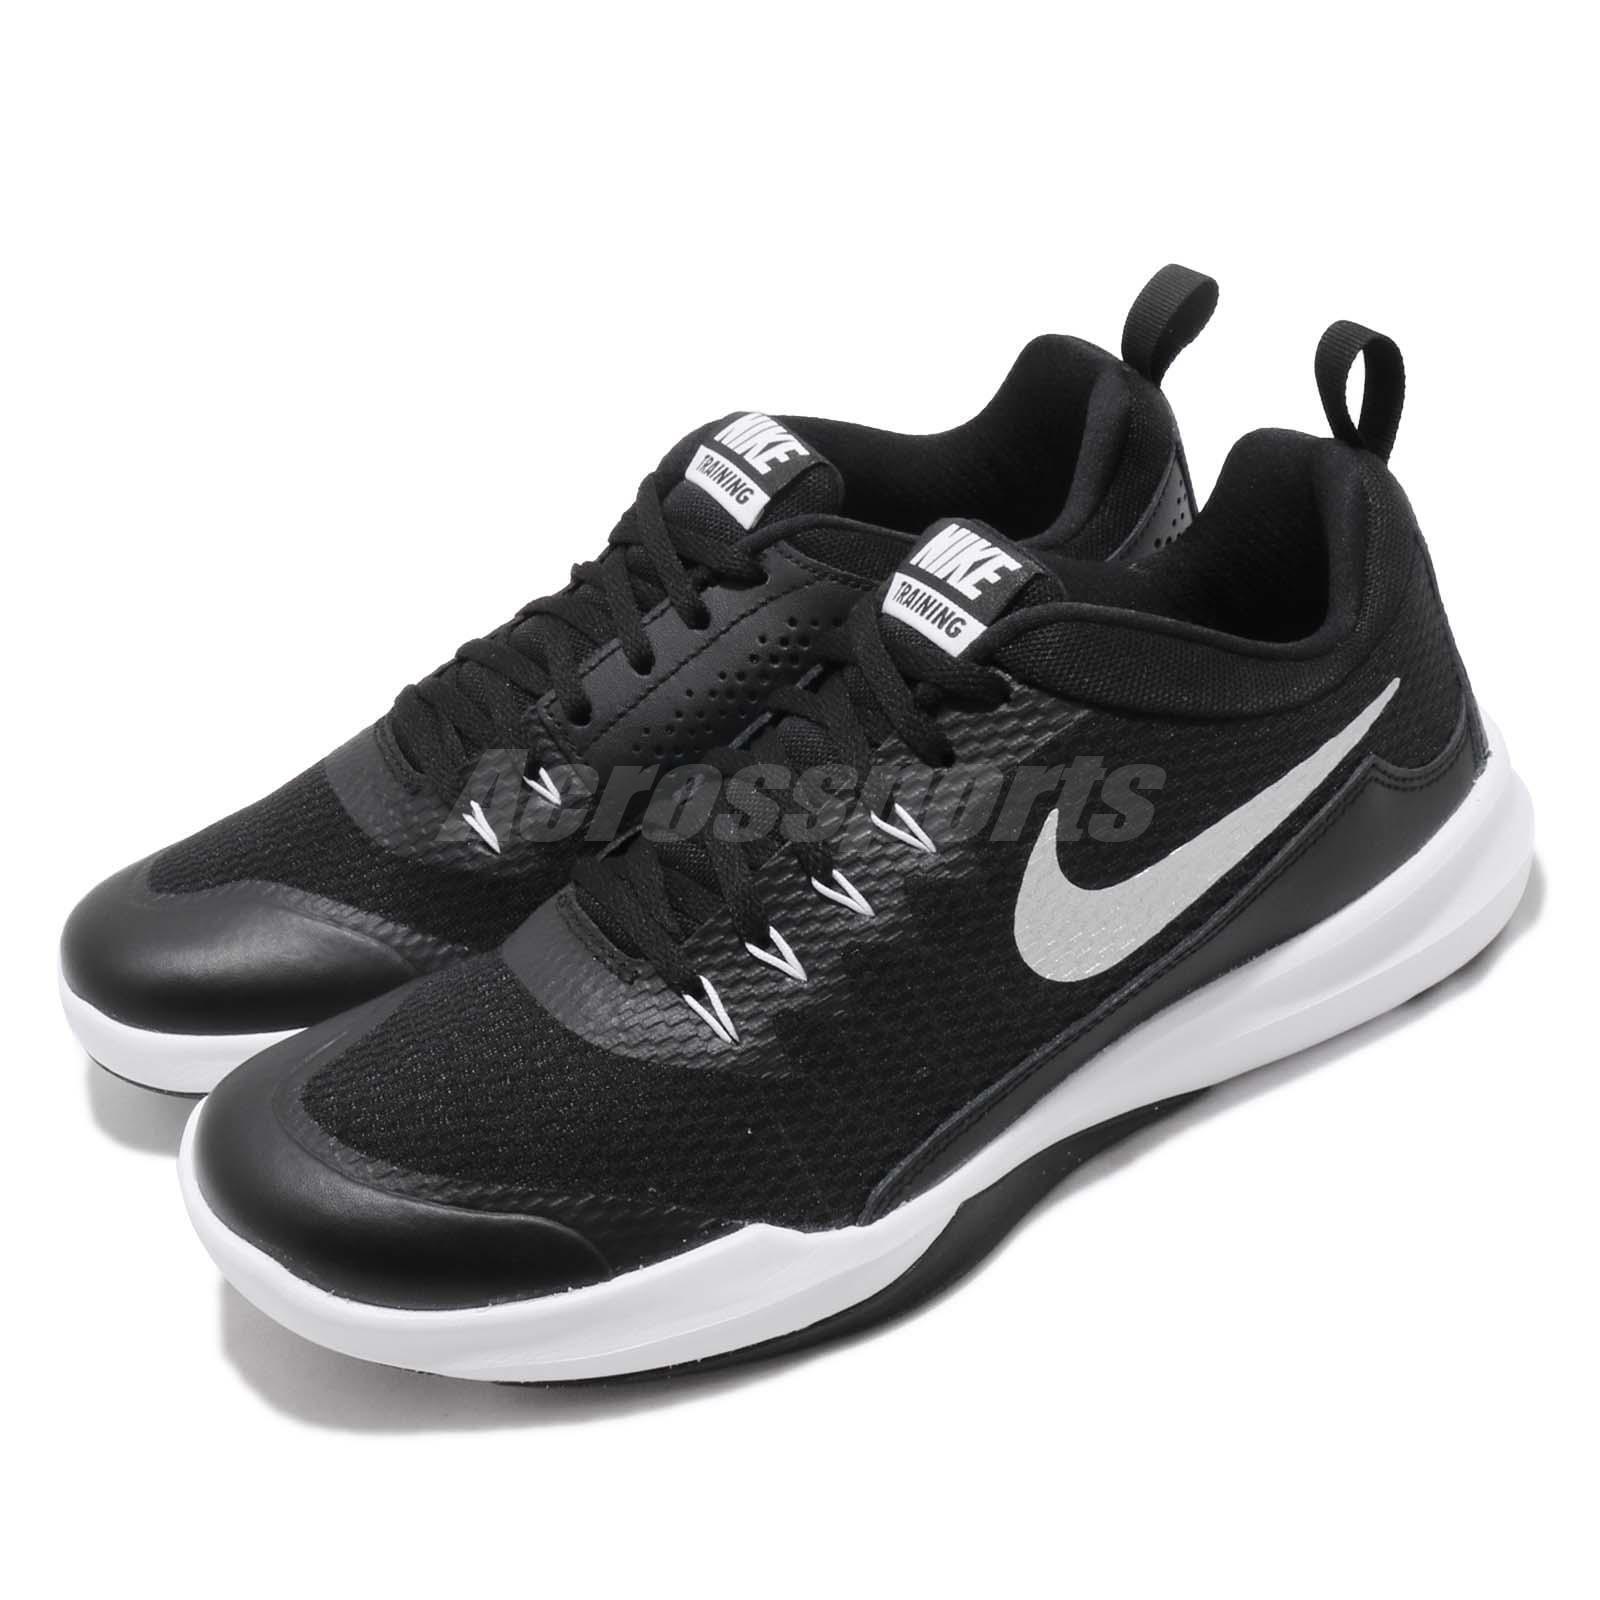 Nike Legend Trainer Black Silver White Men Men Men Cross Training shoes 924206-001 c5df53